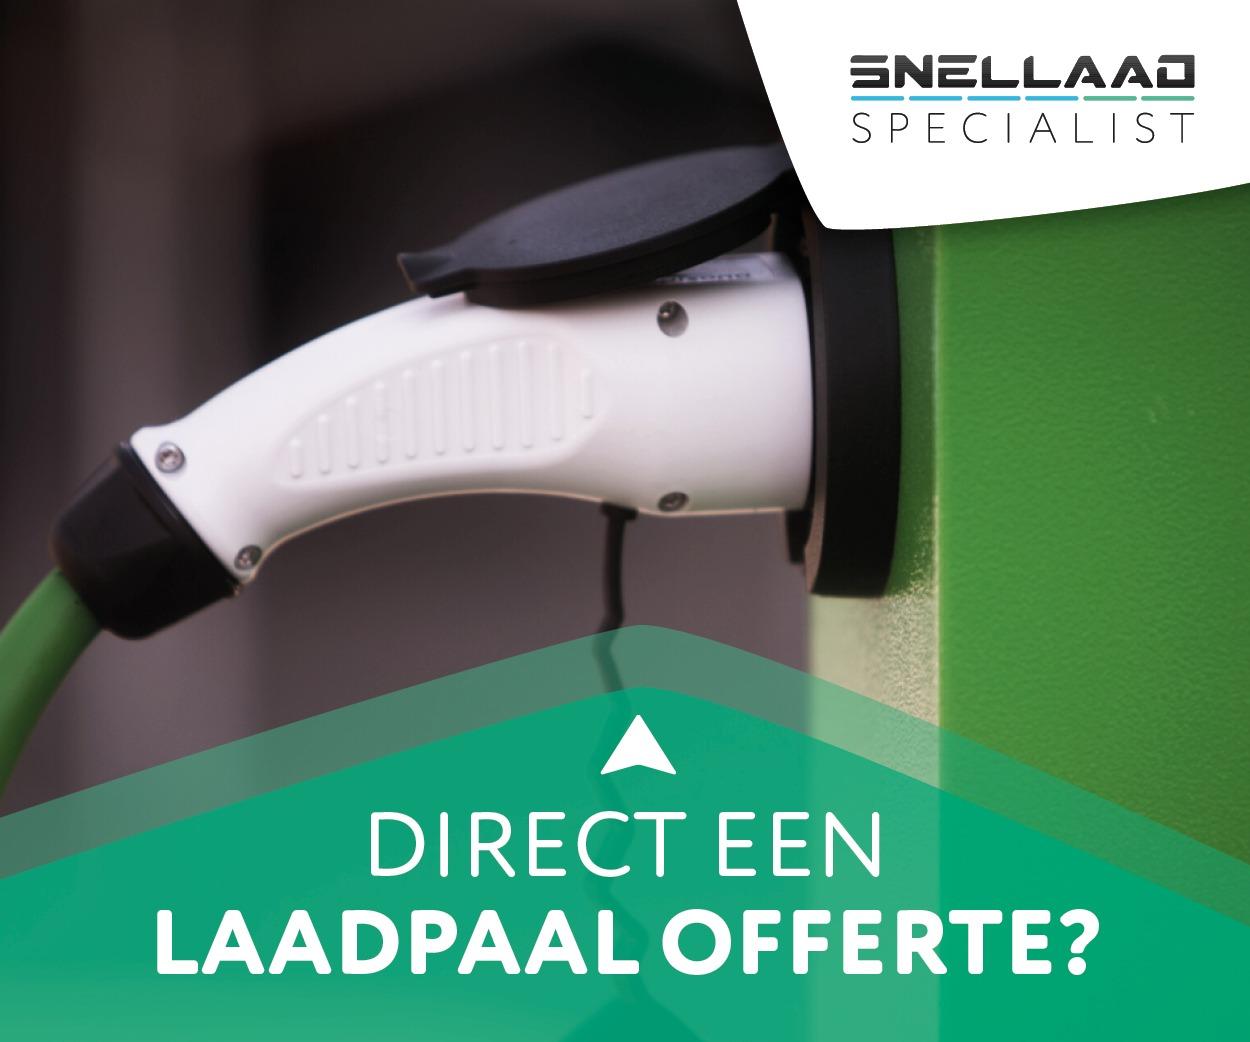 Laadpaal offerte. snellaadspecialist.nl